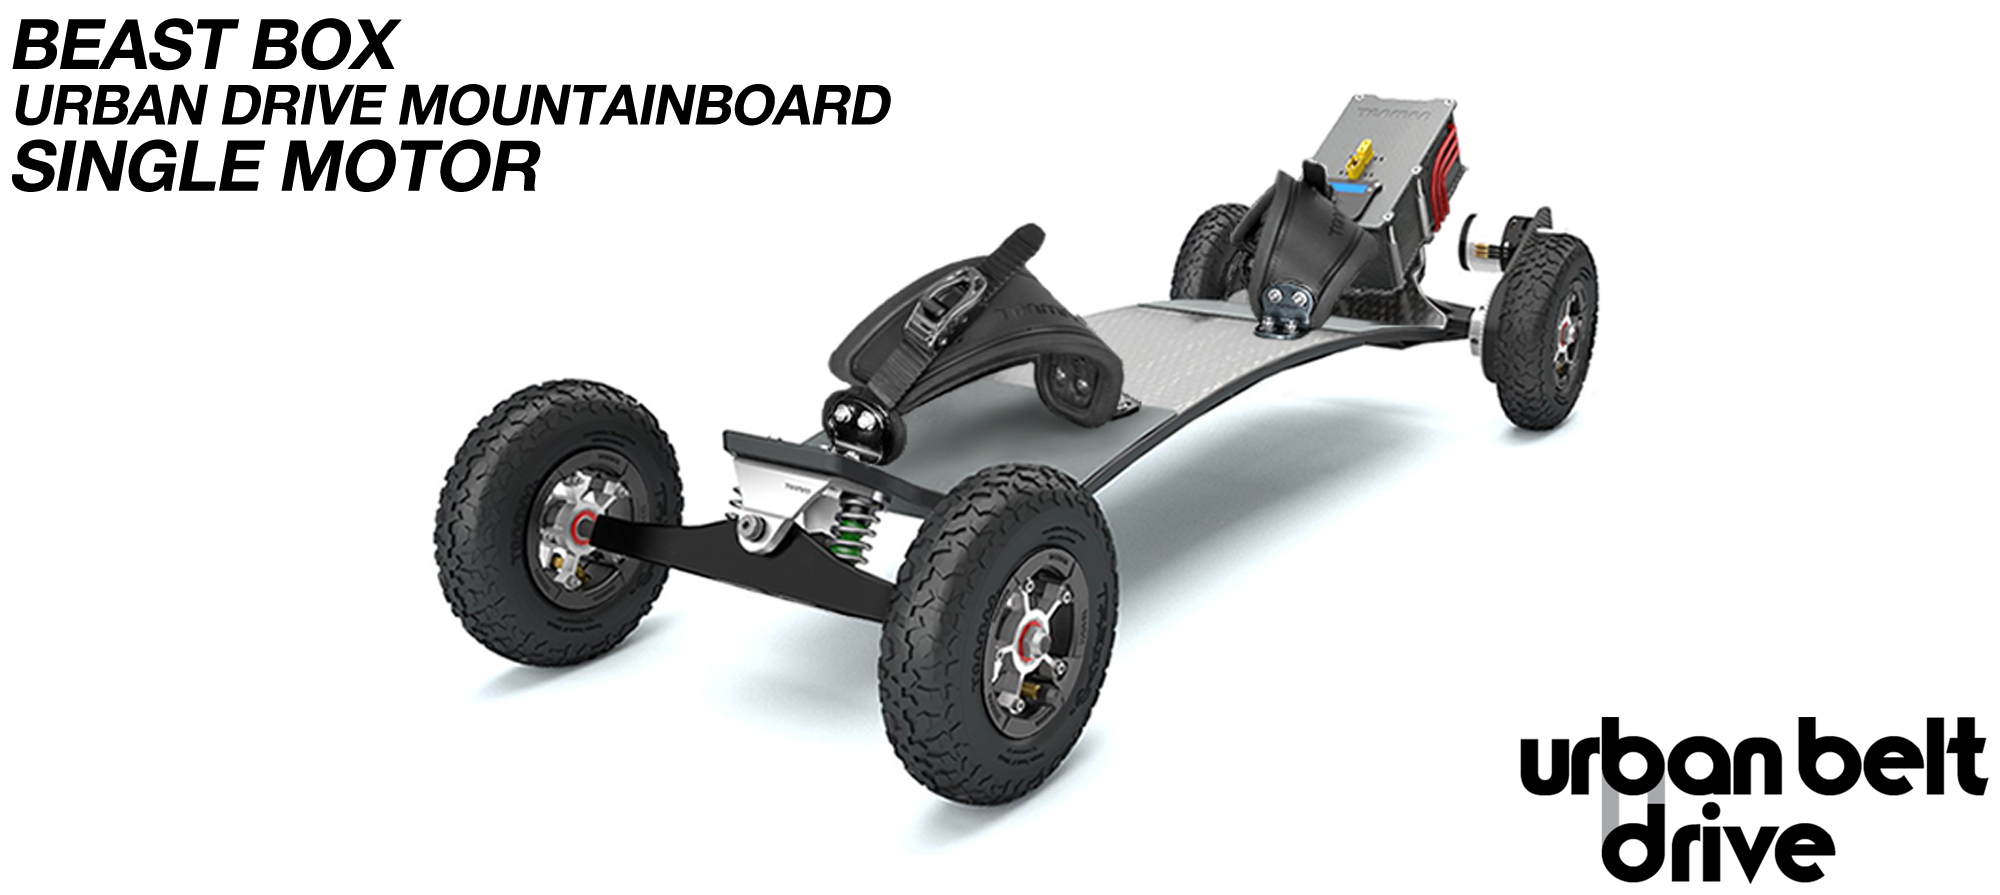 URBAN Electric Mountainboard - Urban Motor Mounts on Custom TRAMPA deck ATB Trucks 8 inch Wheels BEAST Box Single Motor with VESC